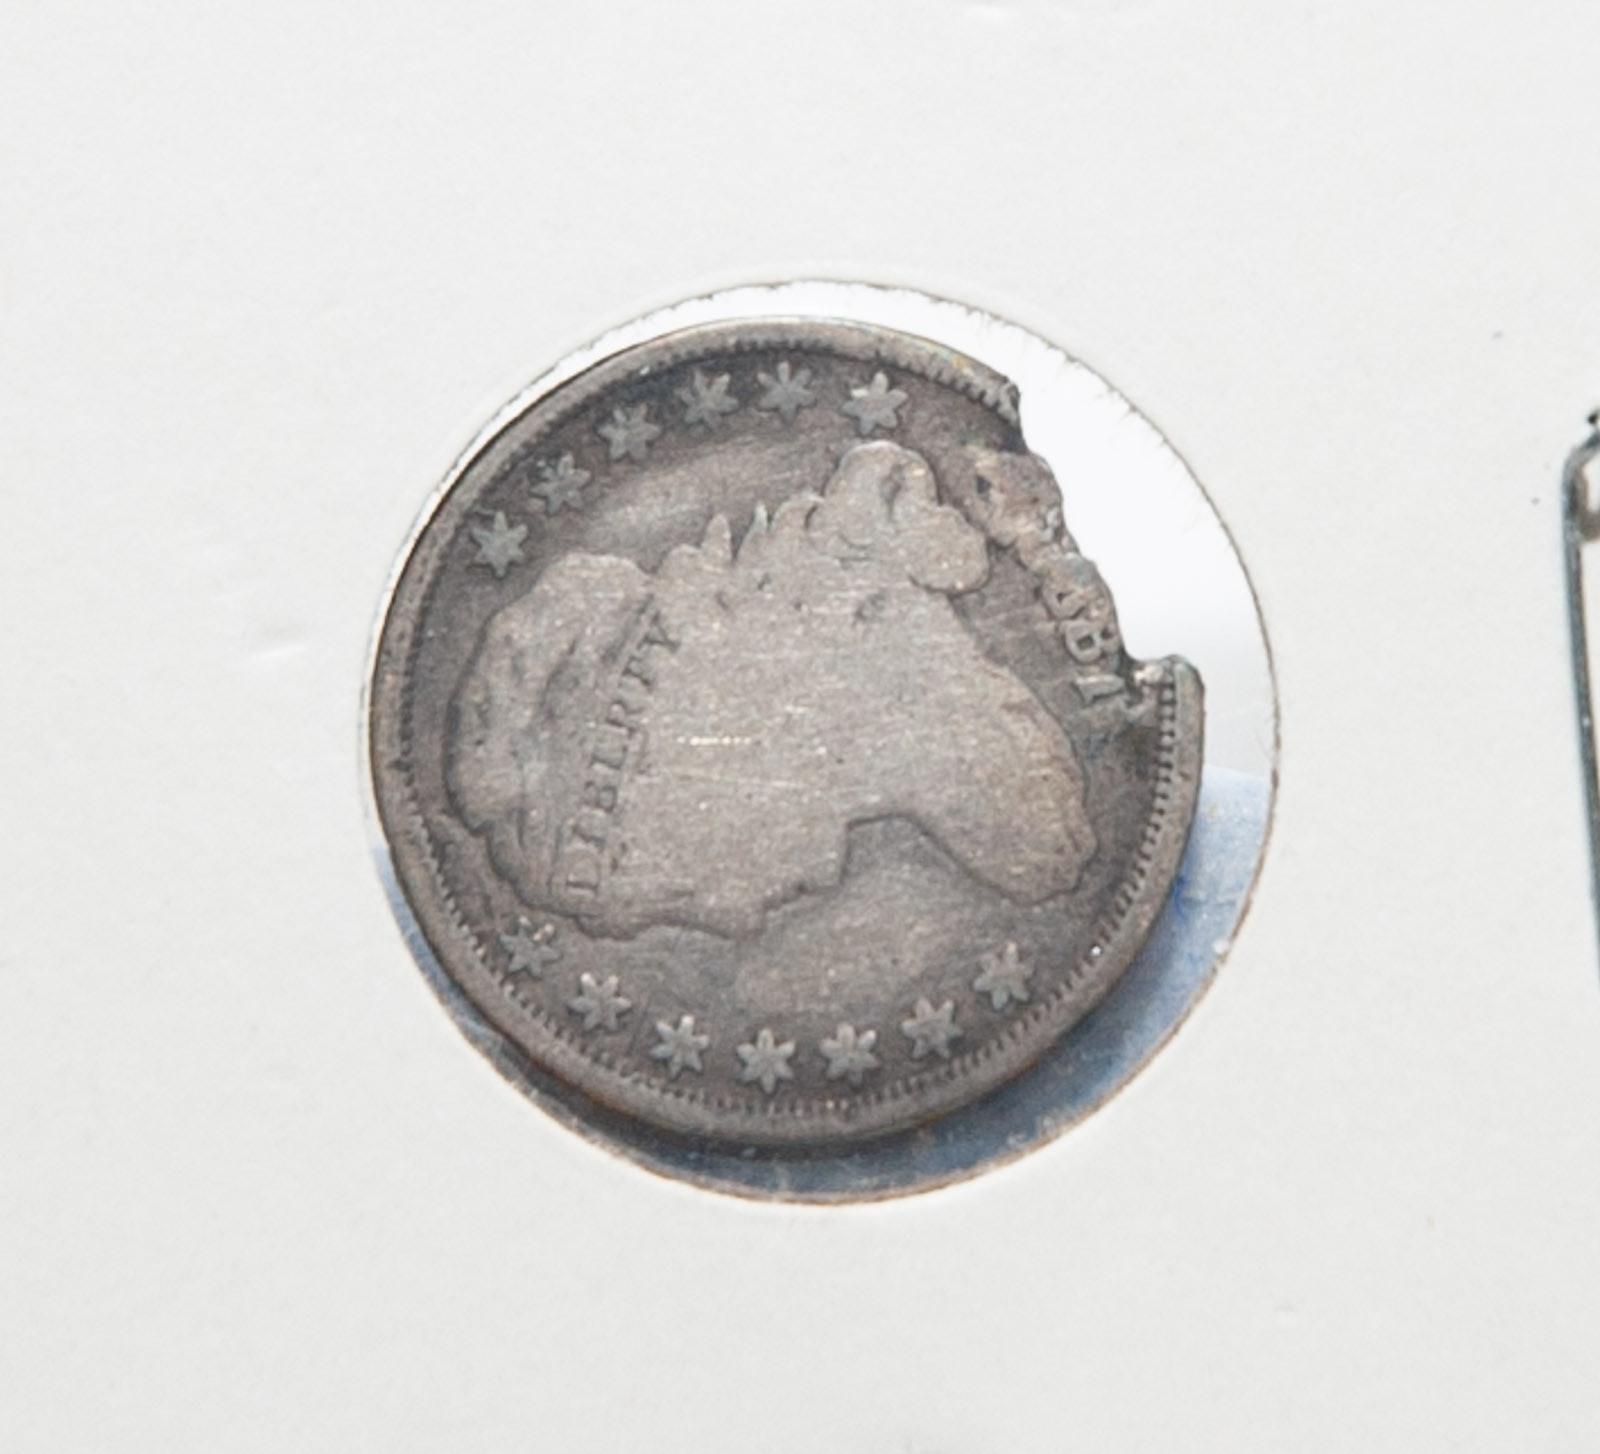 Antique 1800's Capped Bust Dime